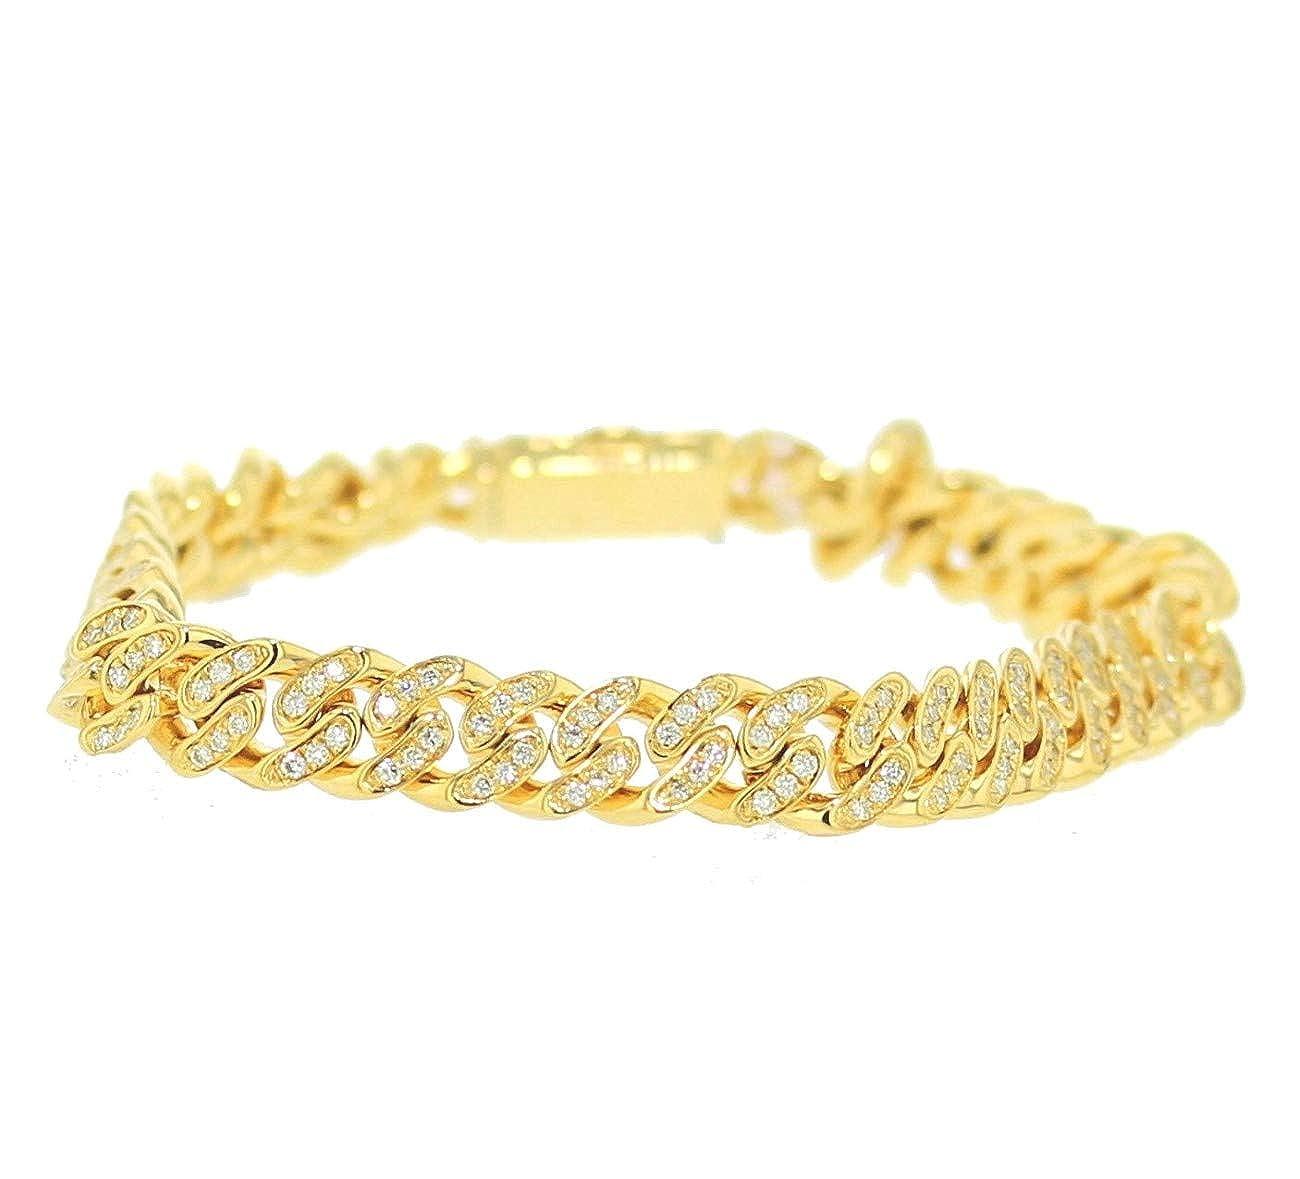 ea55ba843db5c Amazon.com: Midwest Jewellery Diamond Miami Link Bacelet 10K Gold ...